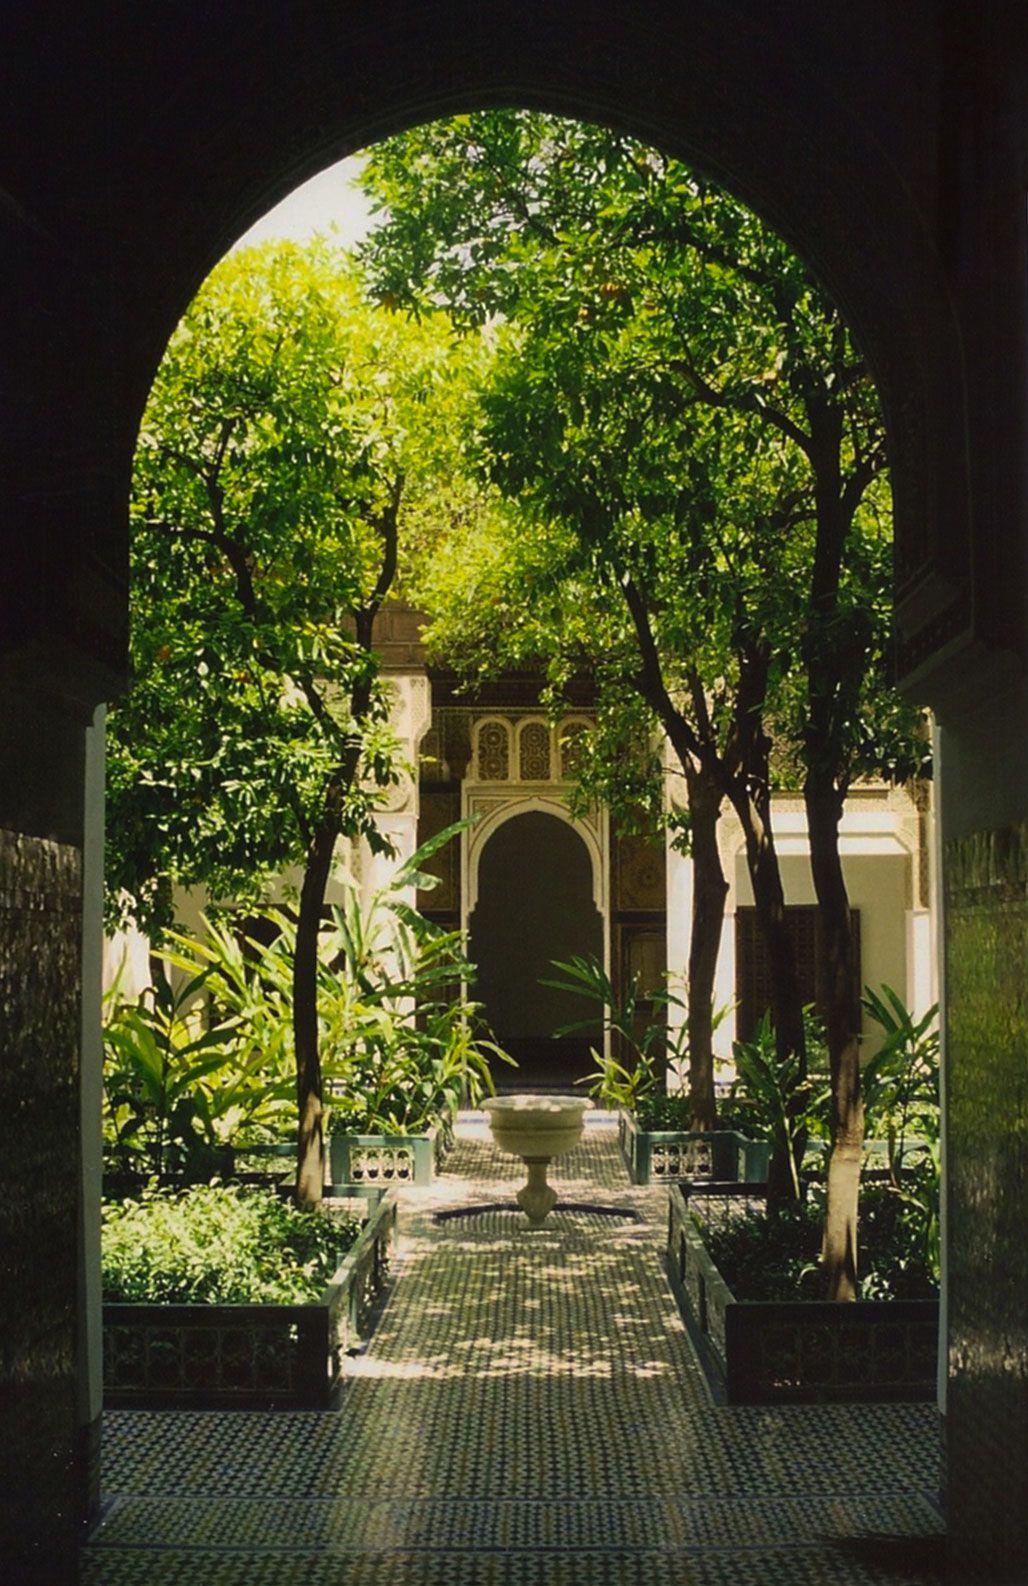 Sir20 photography — Moroccan riad courtyard by sir20